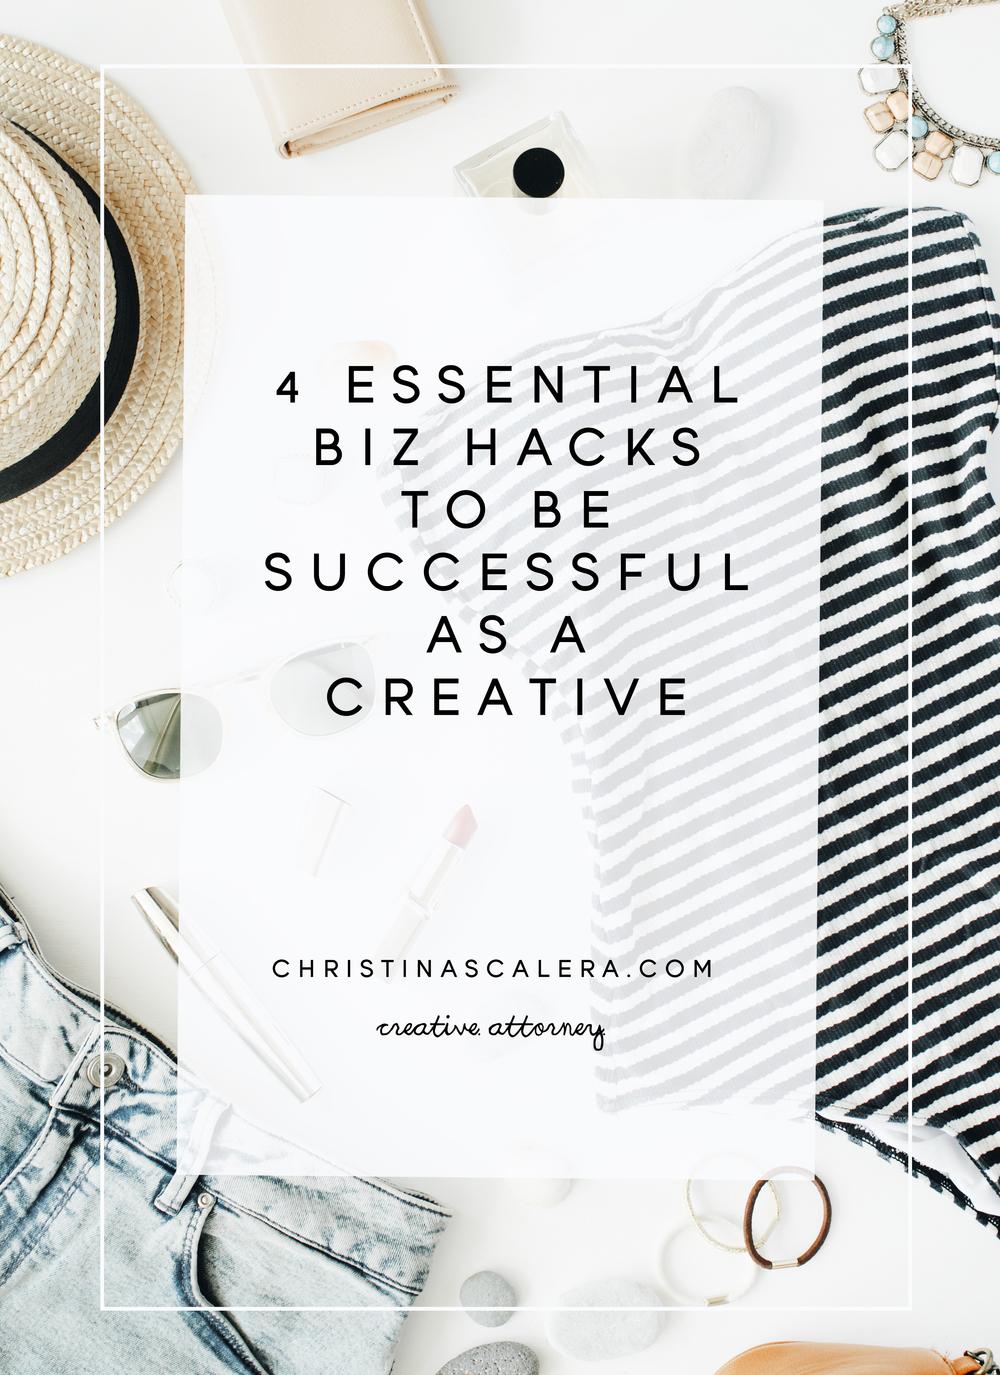 4 Essential biz hacks to be successful as a creative.